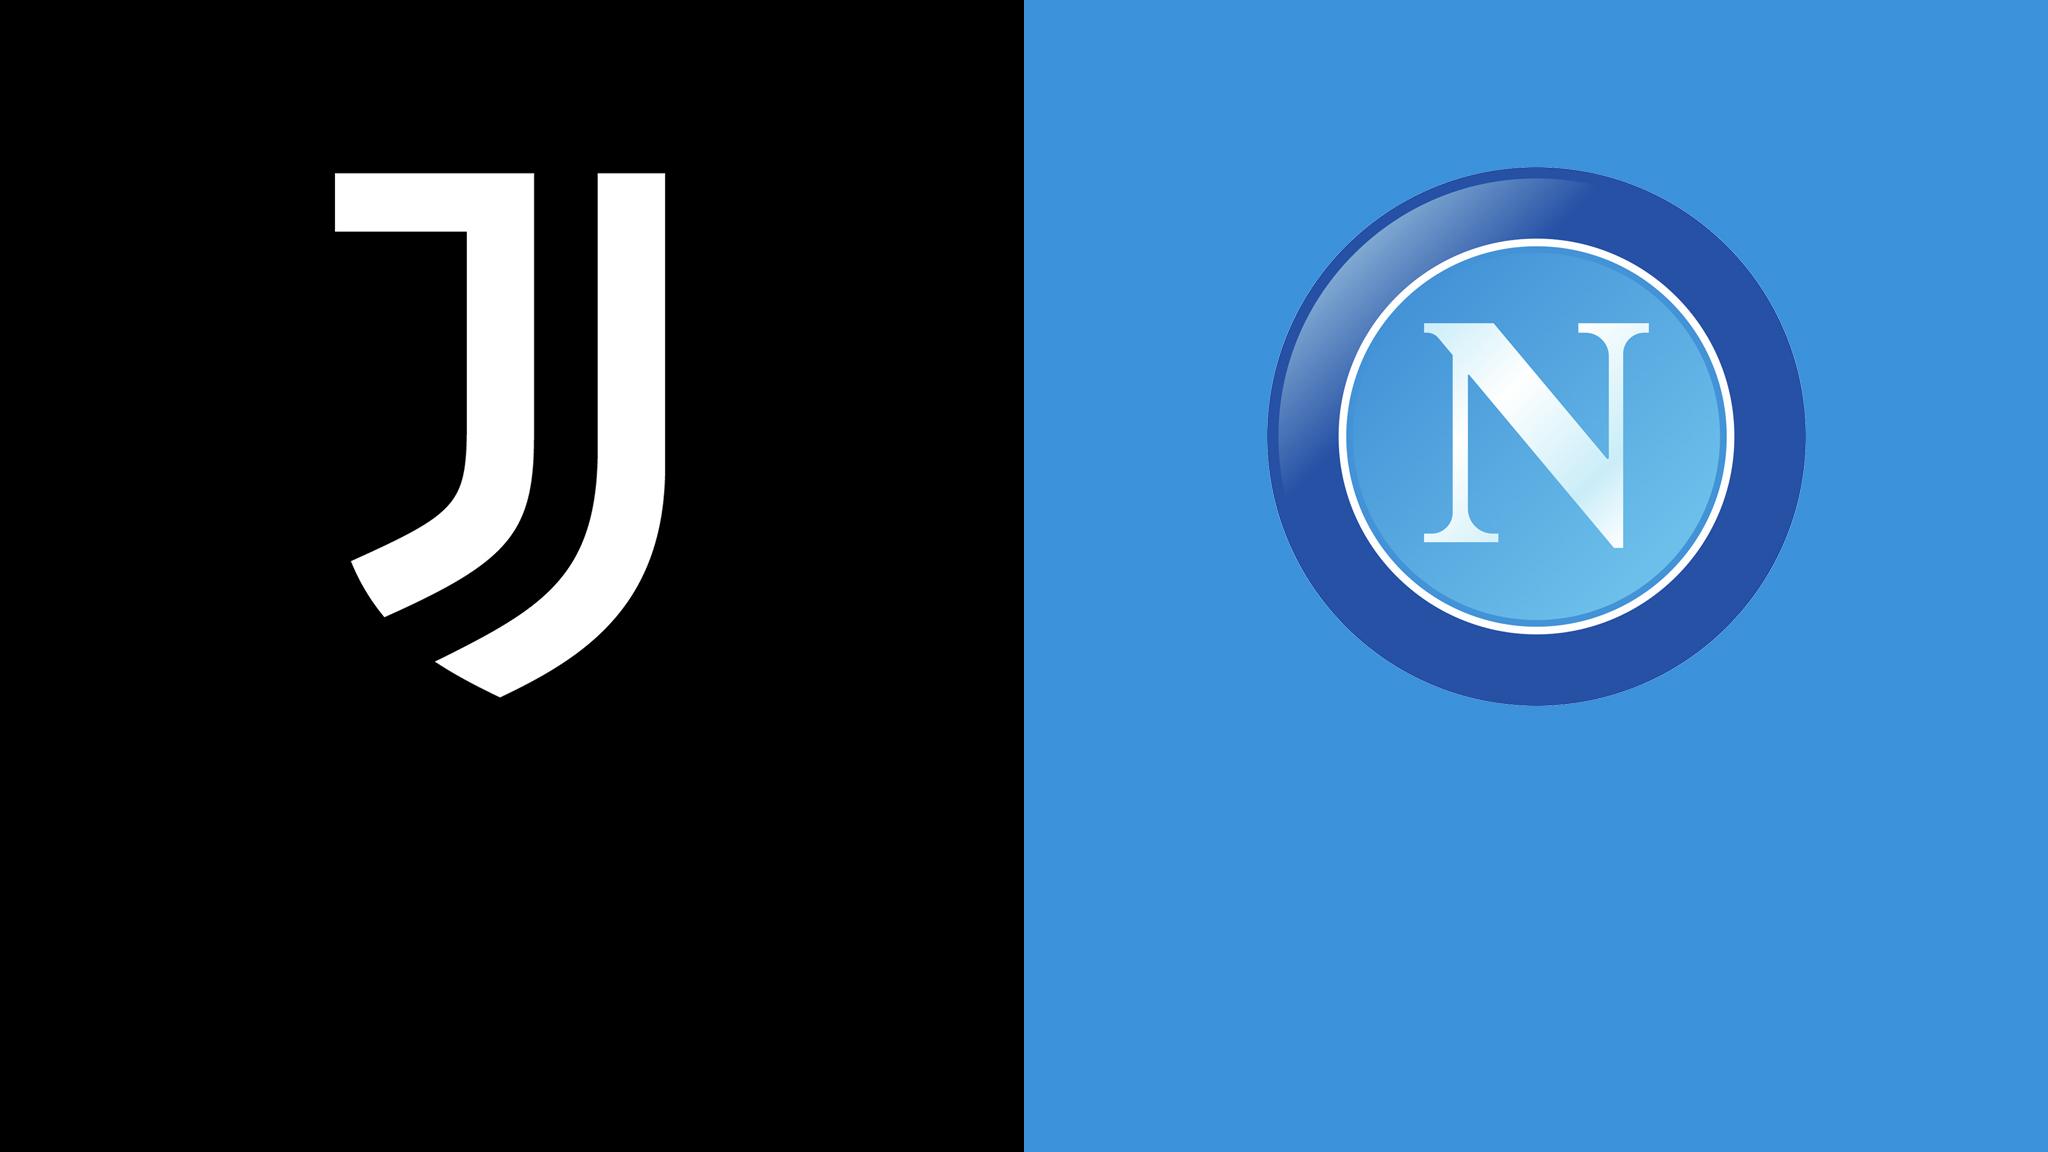 Napoli vs Juventus footem